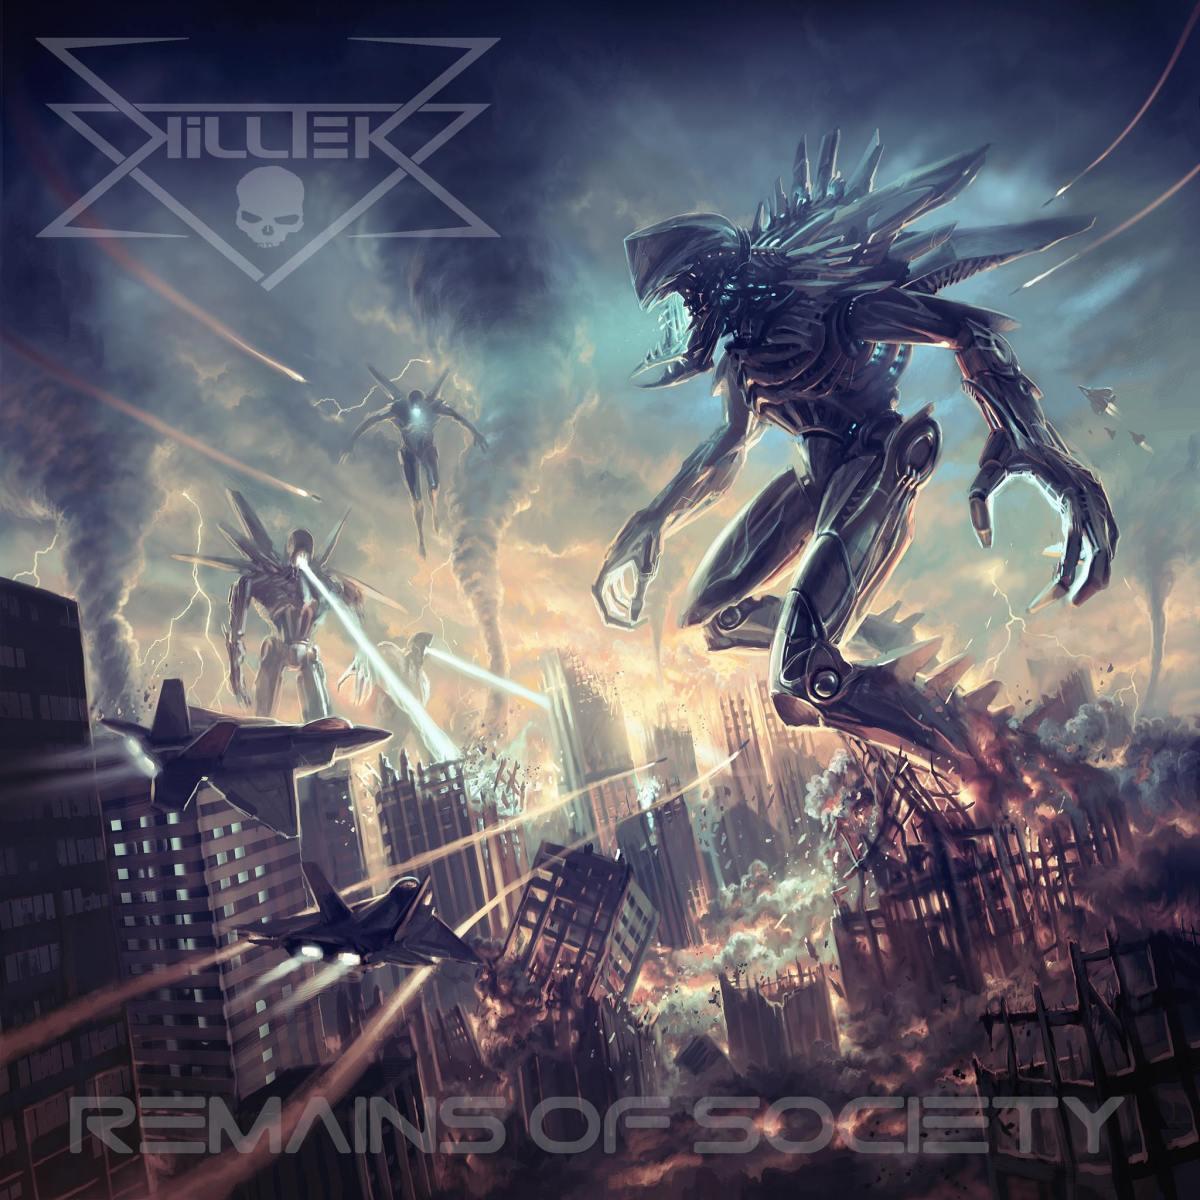 Killtek – Remains of Society(Review)